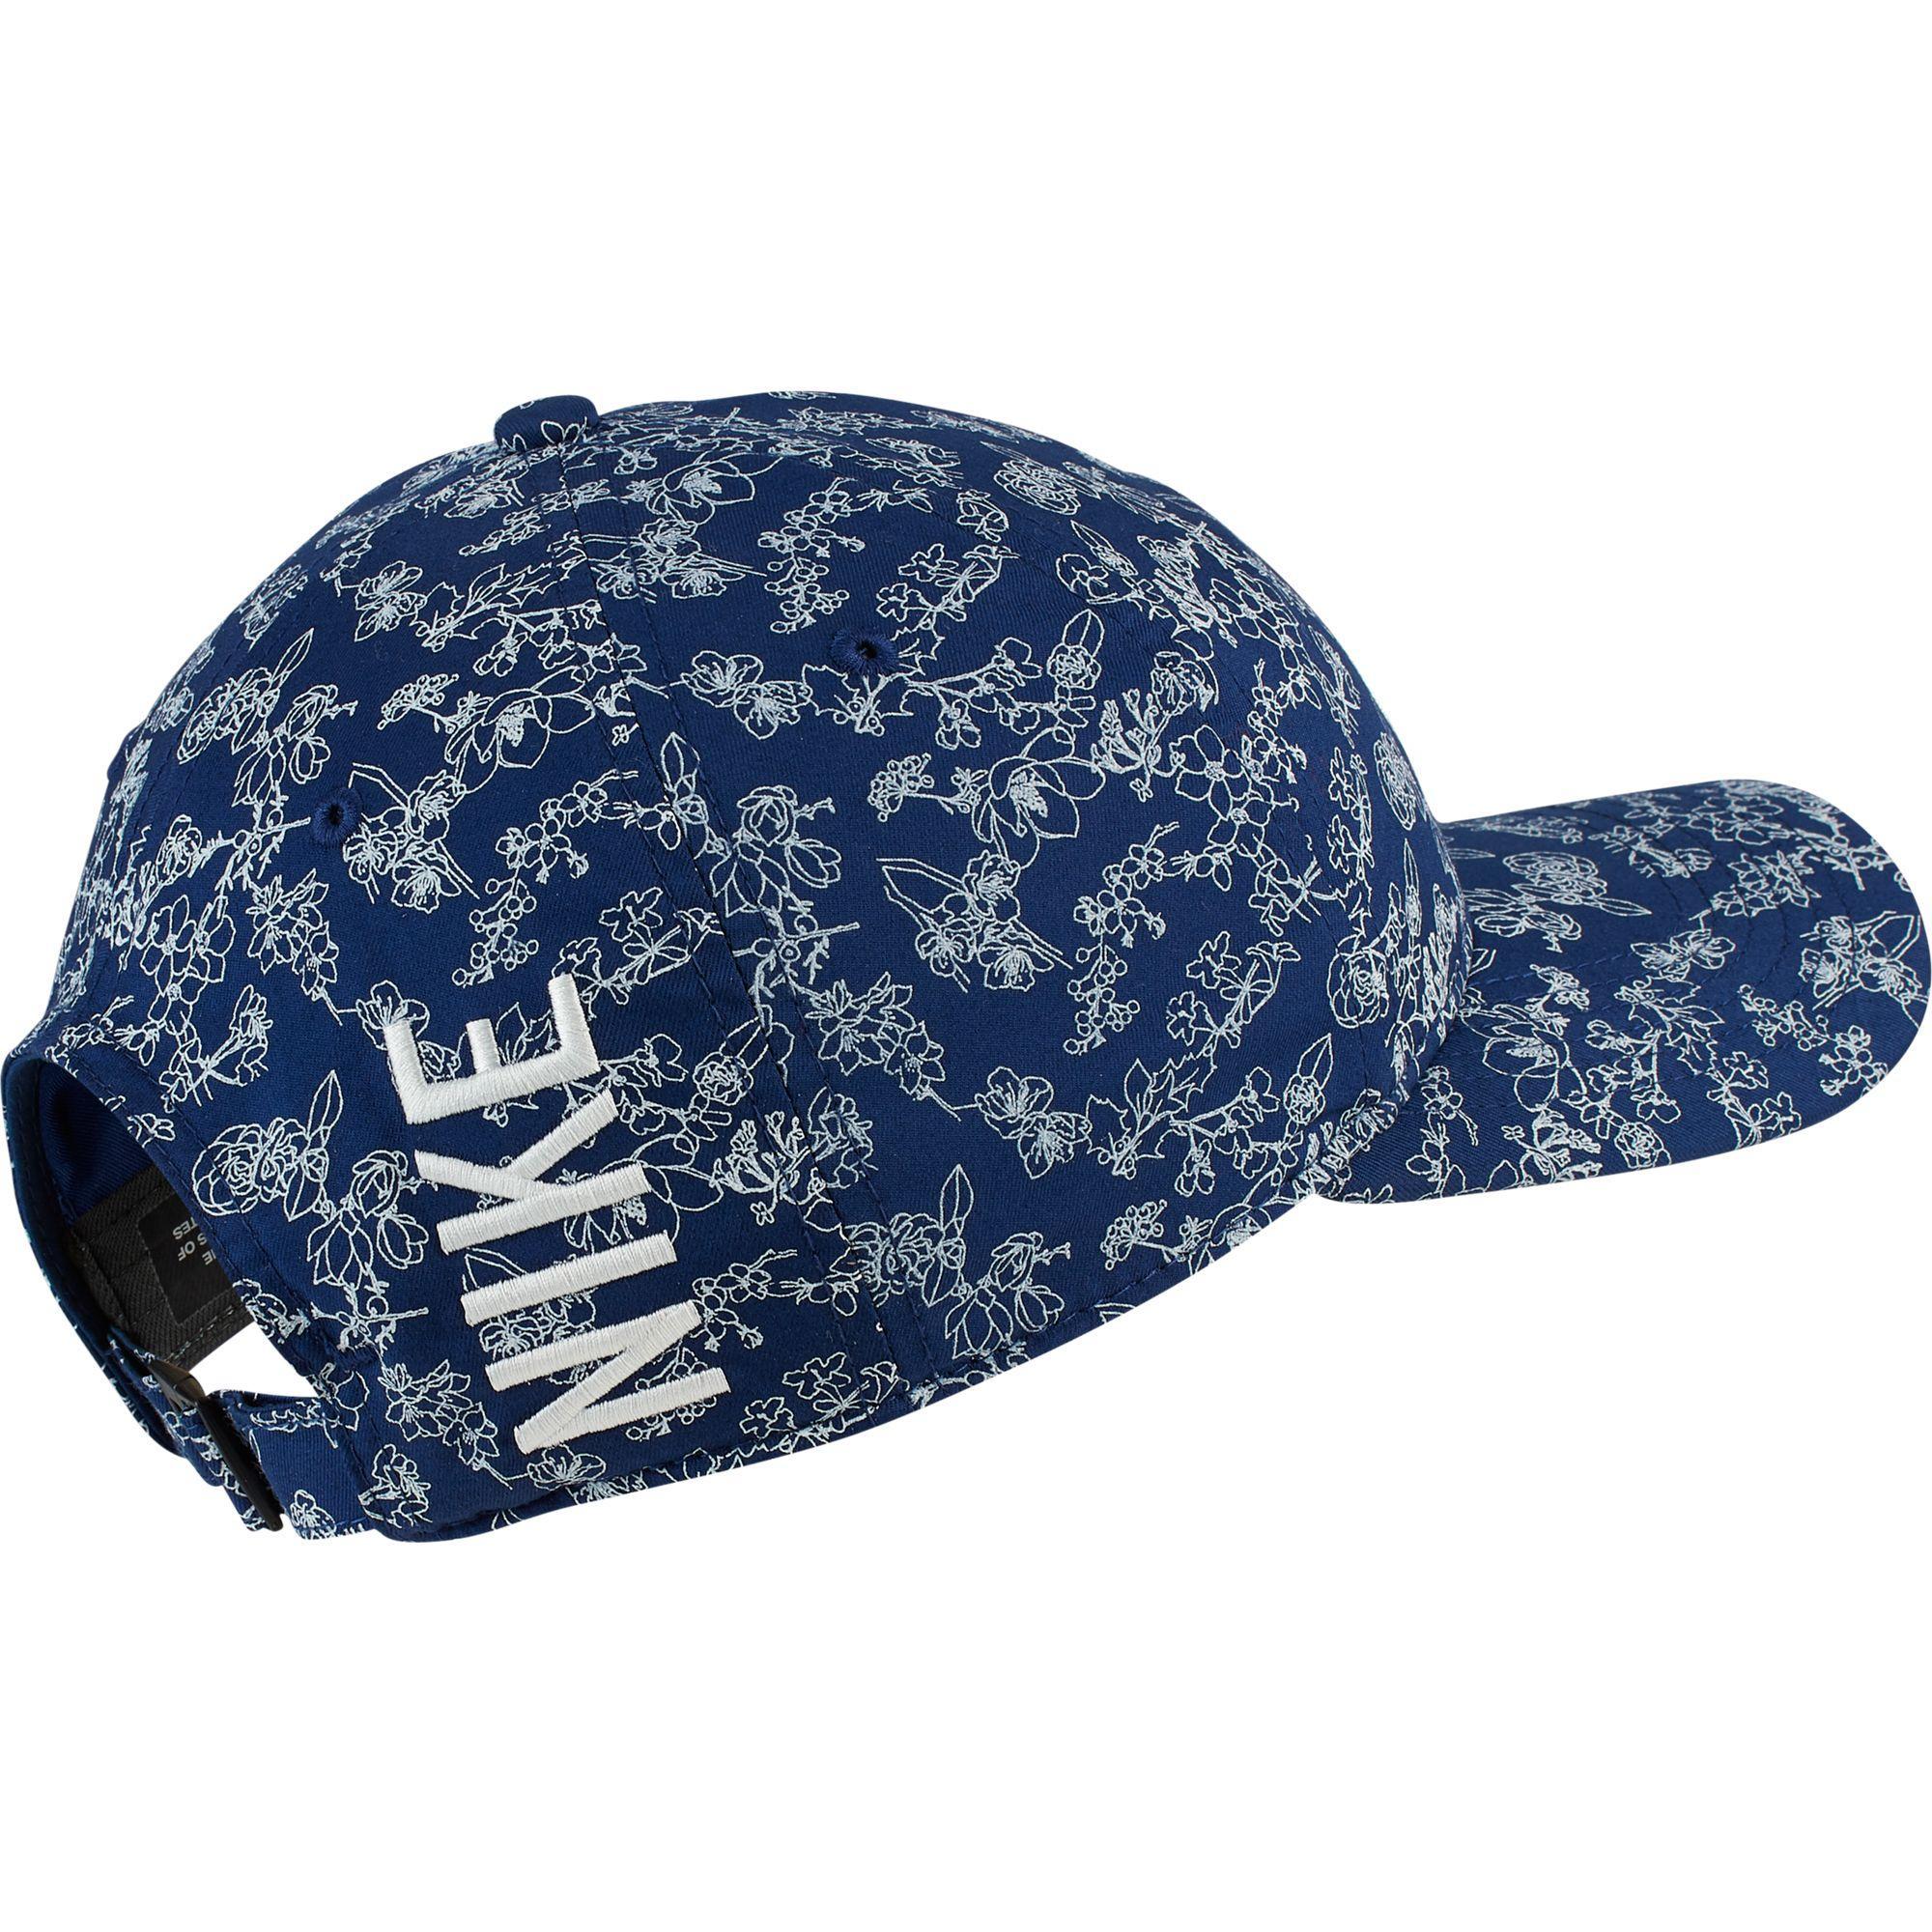 b8c4c67d5e68c Nike - Blue Majors Aerobill Classic99 Golf Hat for Men - Lyst. View  fullscreen